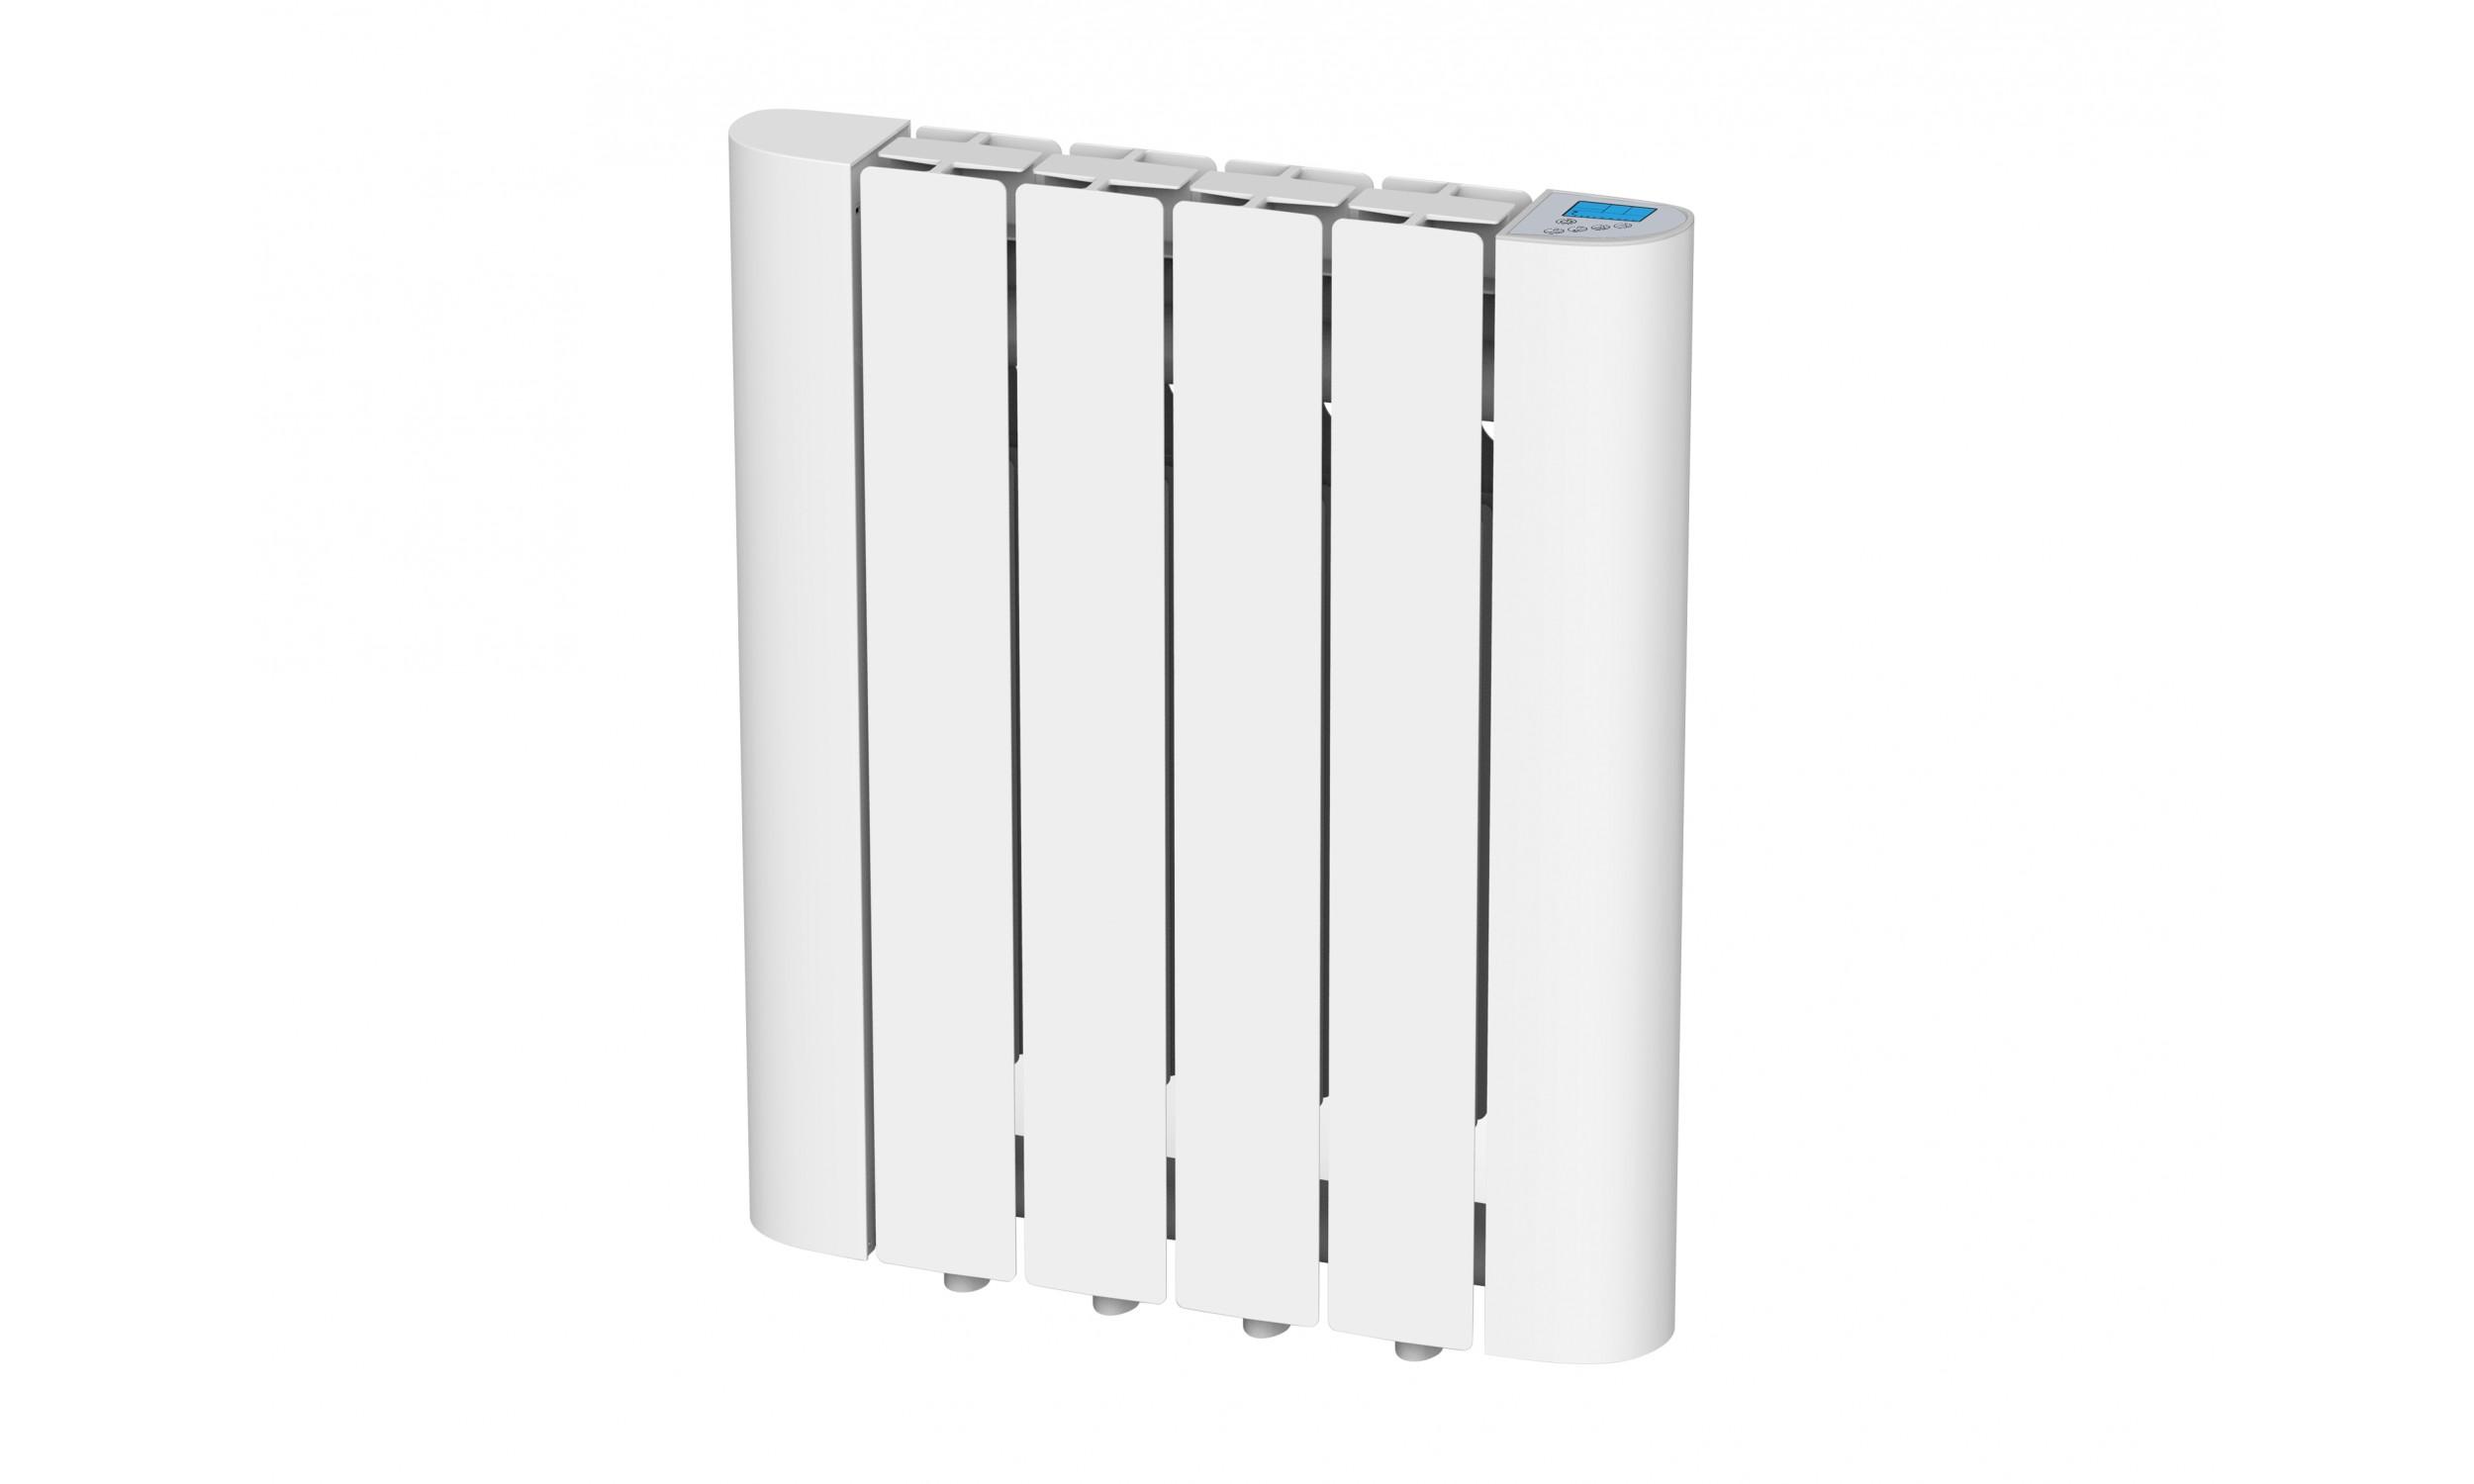 Digital Thermal Inertia radiator with internal fluid, 600W, wifi, Radoil A600